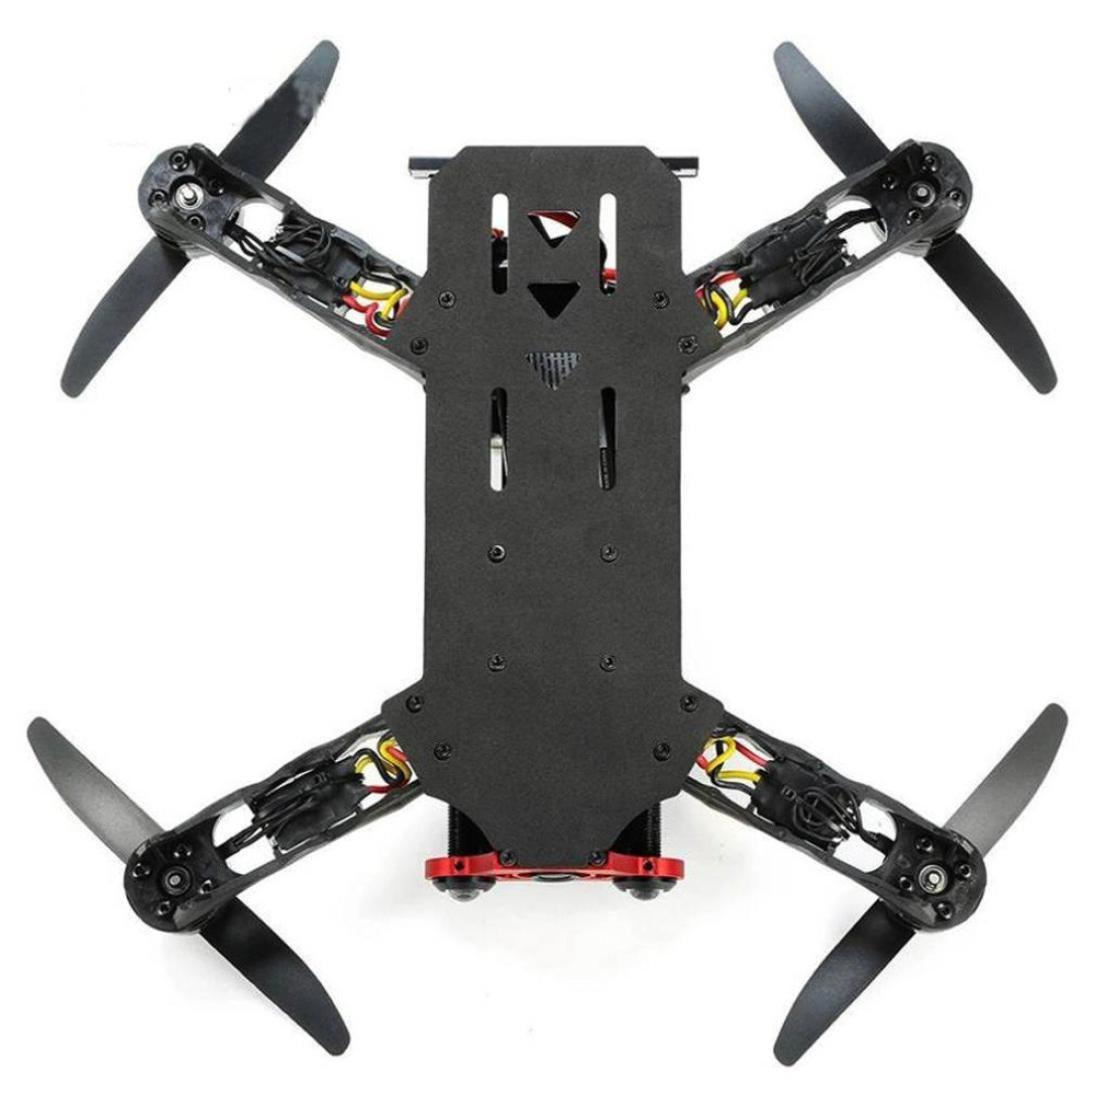 Dreamyth Durable Eachine Racer 250 FPV Drone F3 NAZE32 CC3D I6 2.4G 6CH VTX RTF RC Quadcopter (Black)